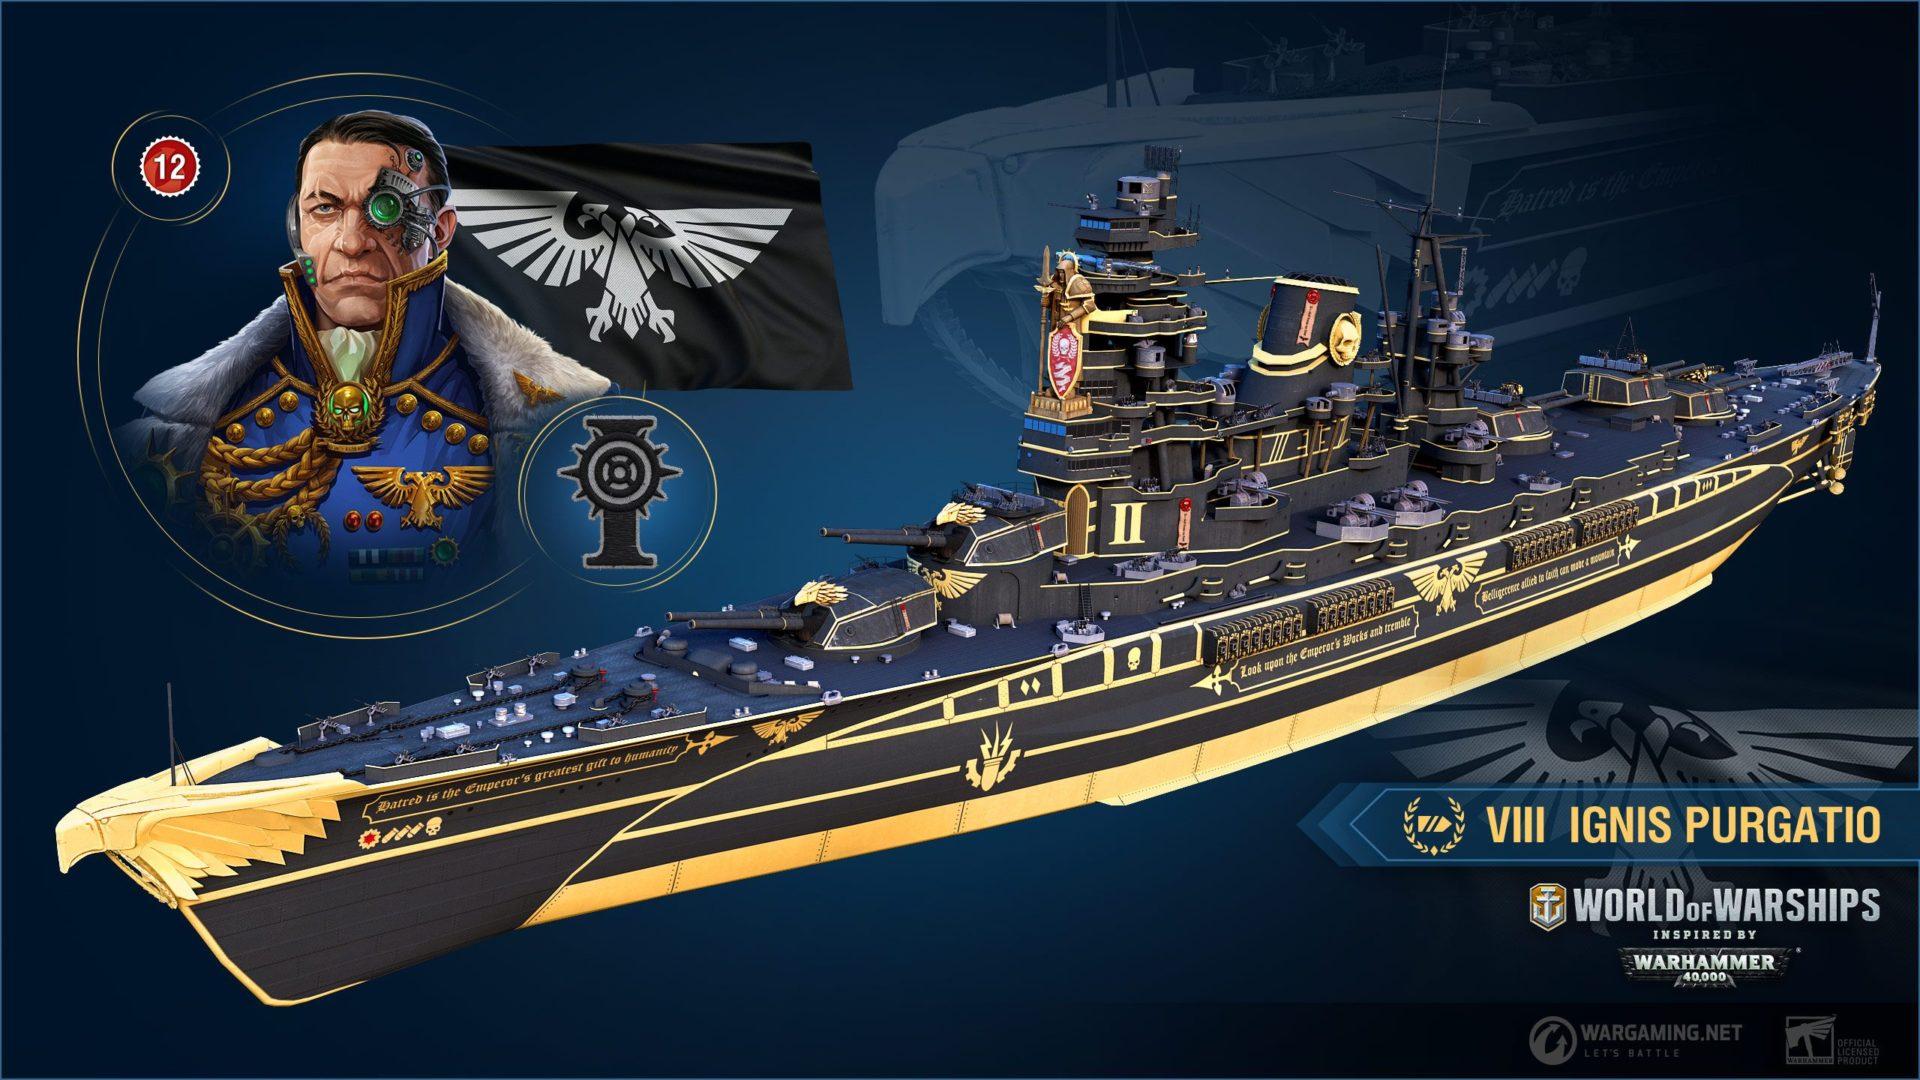 World of Warships Warhammer 40k (1)